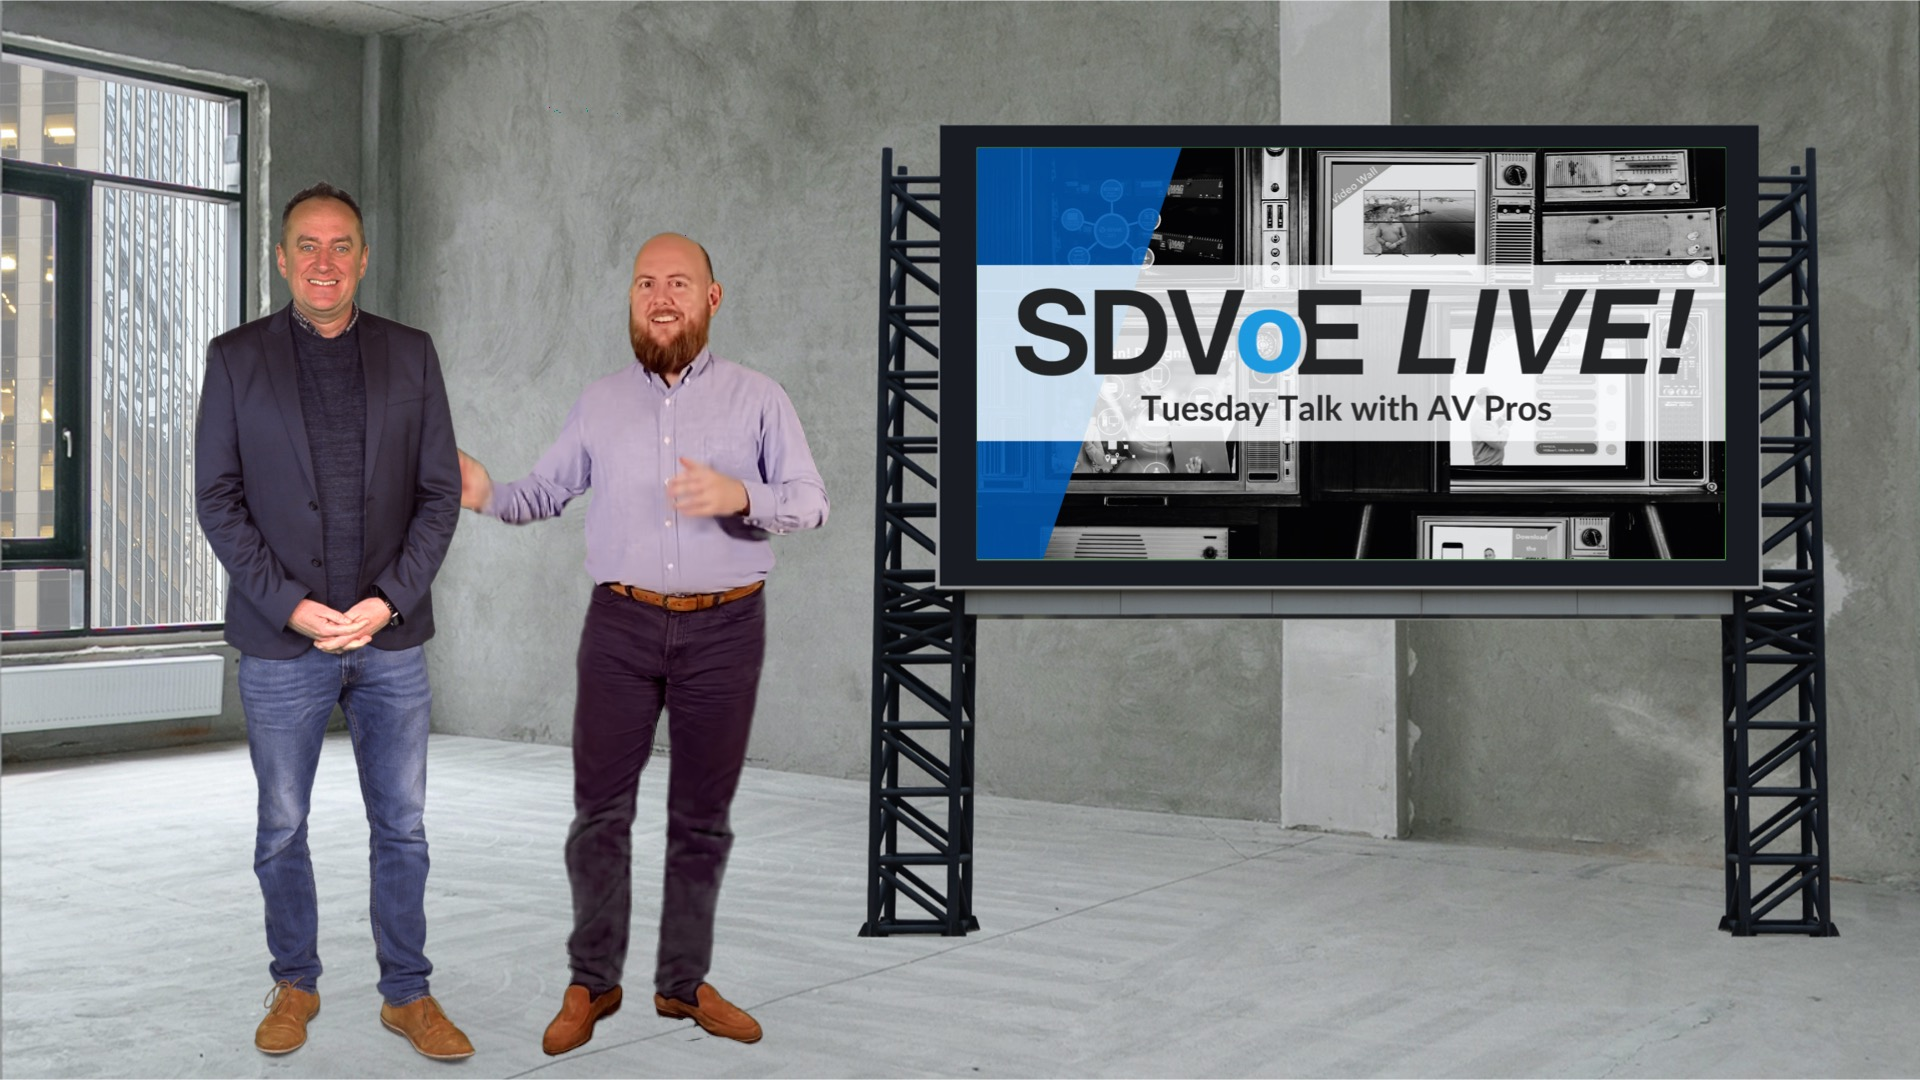 SDVoE LIVE!